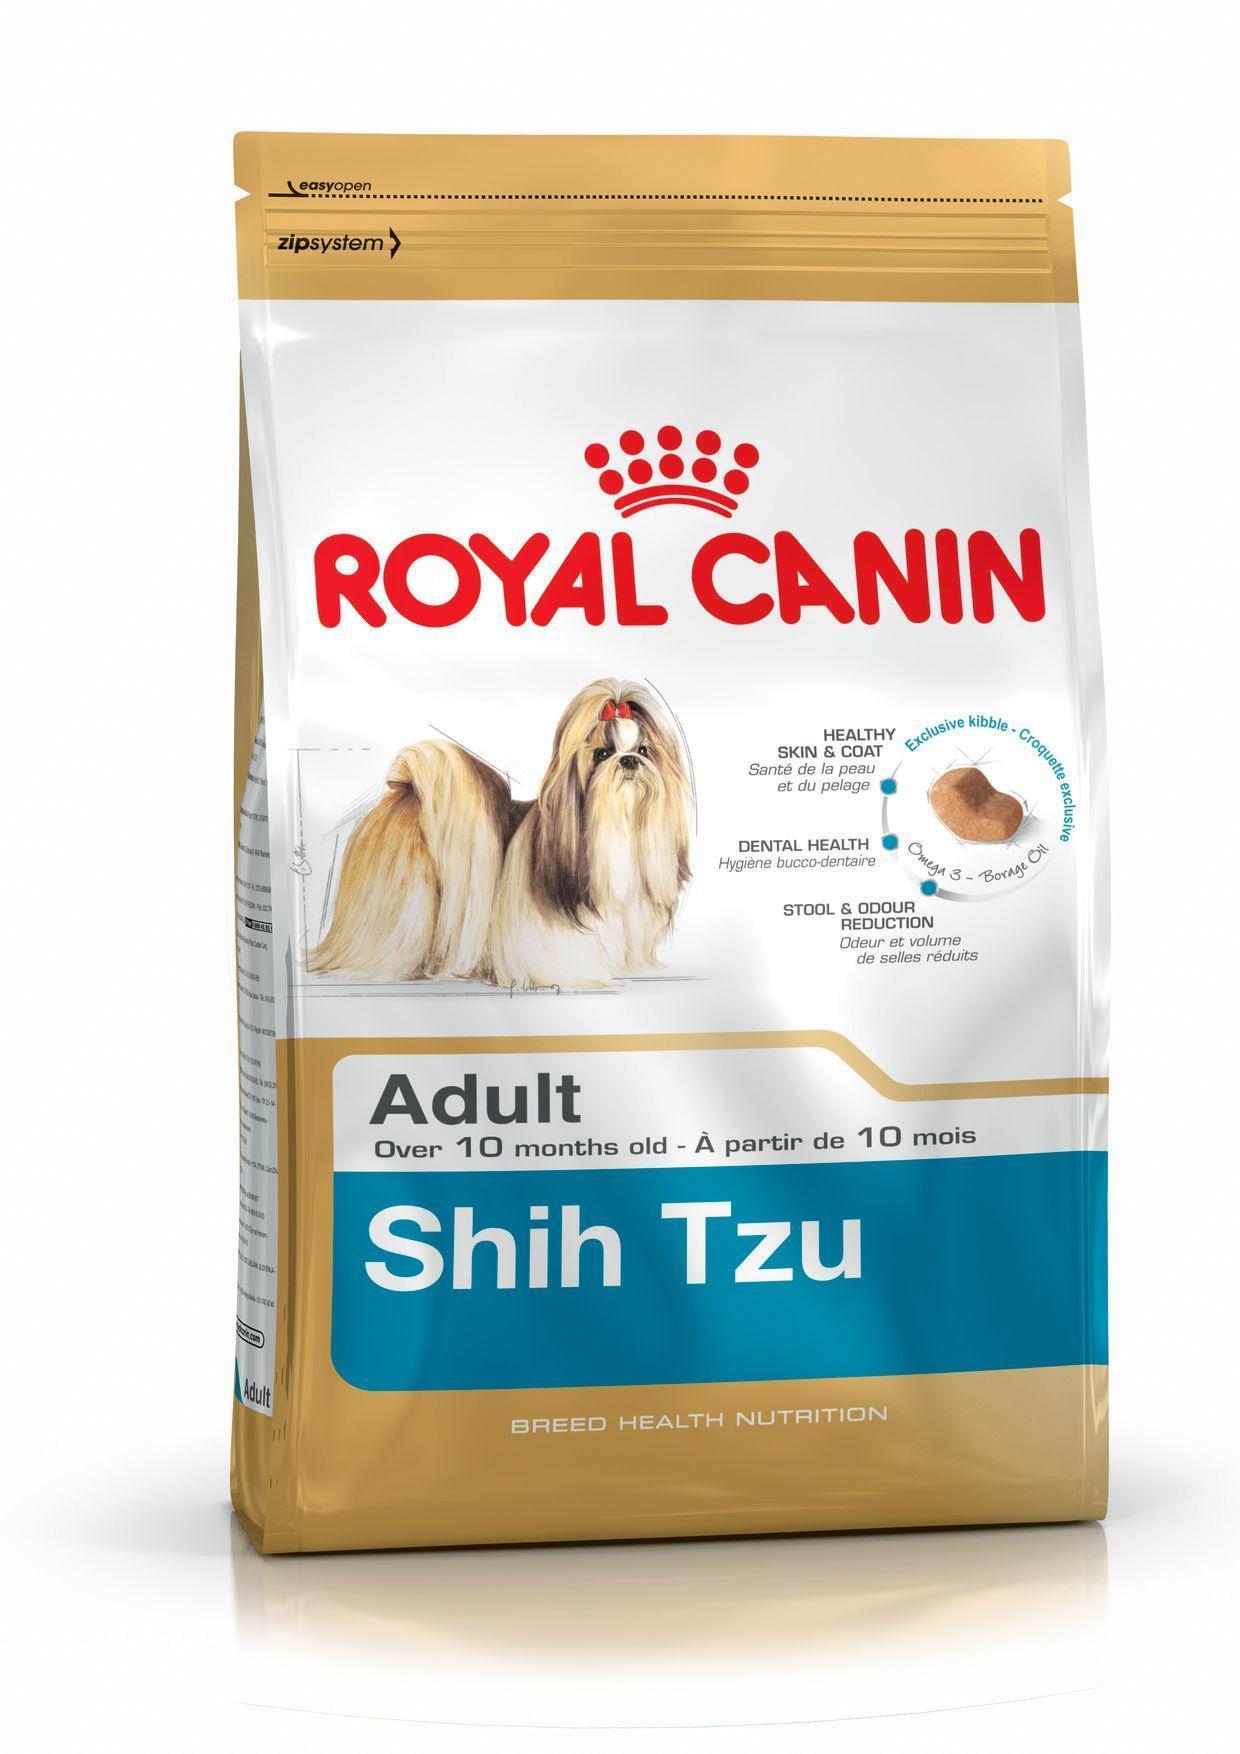 Rpyal Canin Shih Tsu Adult 1,5kg